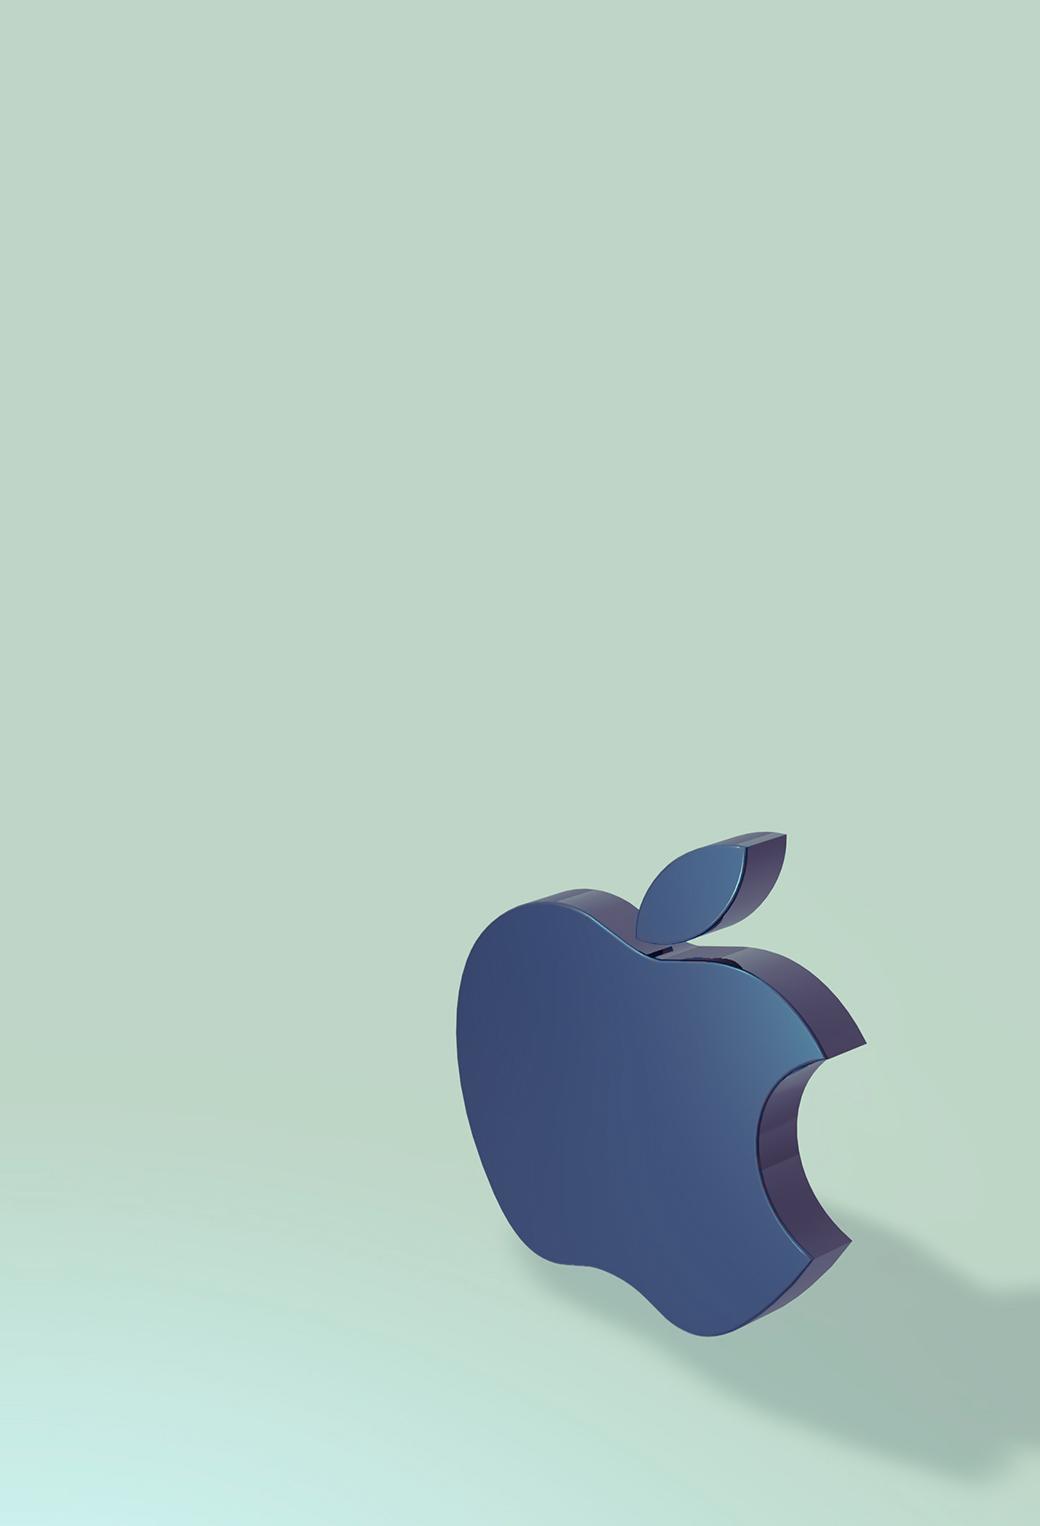 Apple Logo 3D 3Wallpapers iPhone